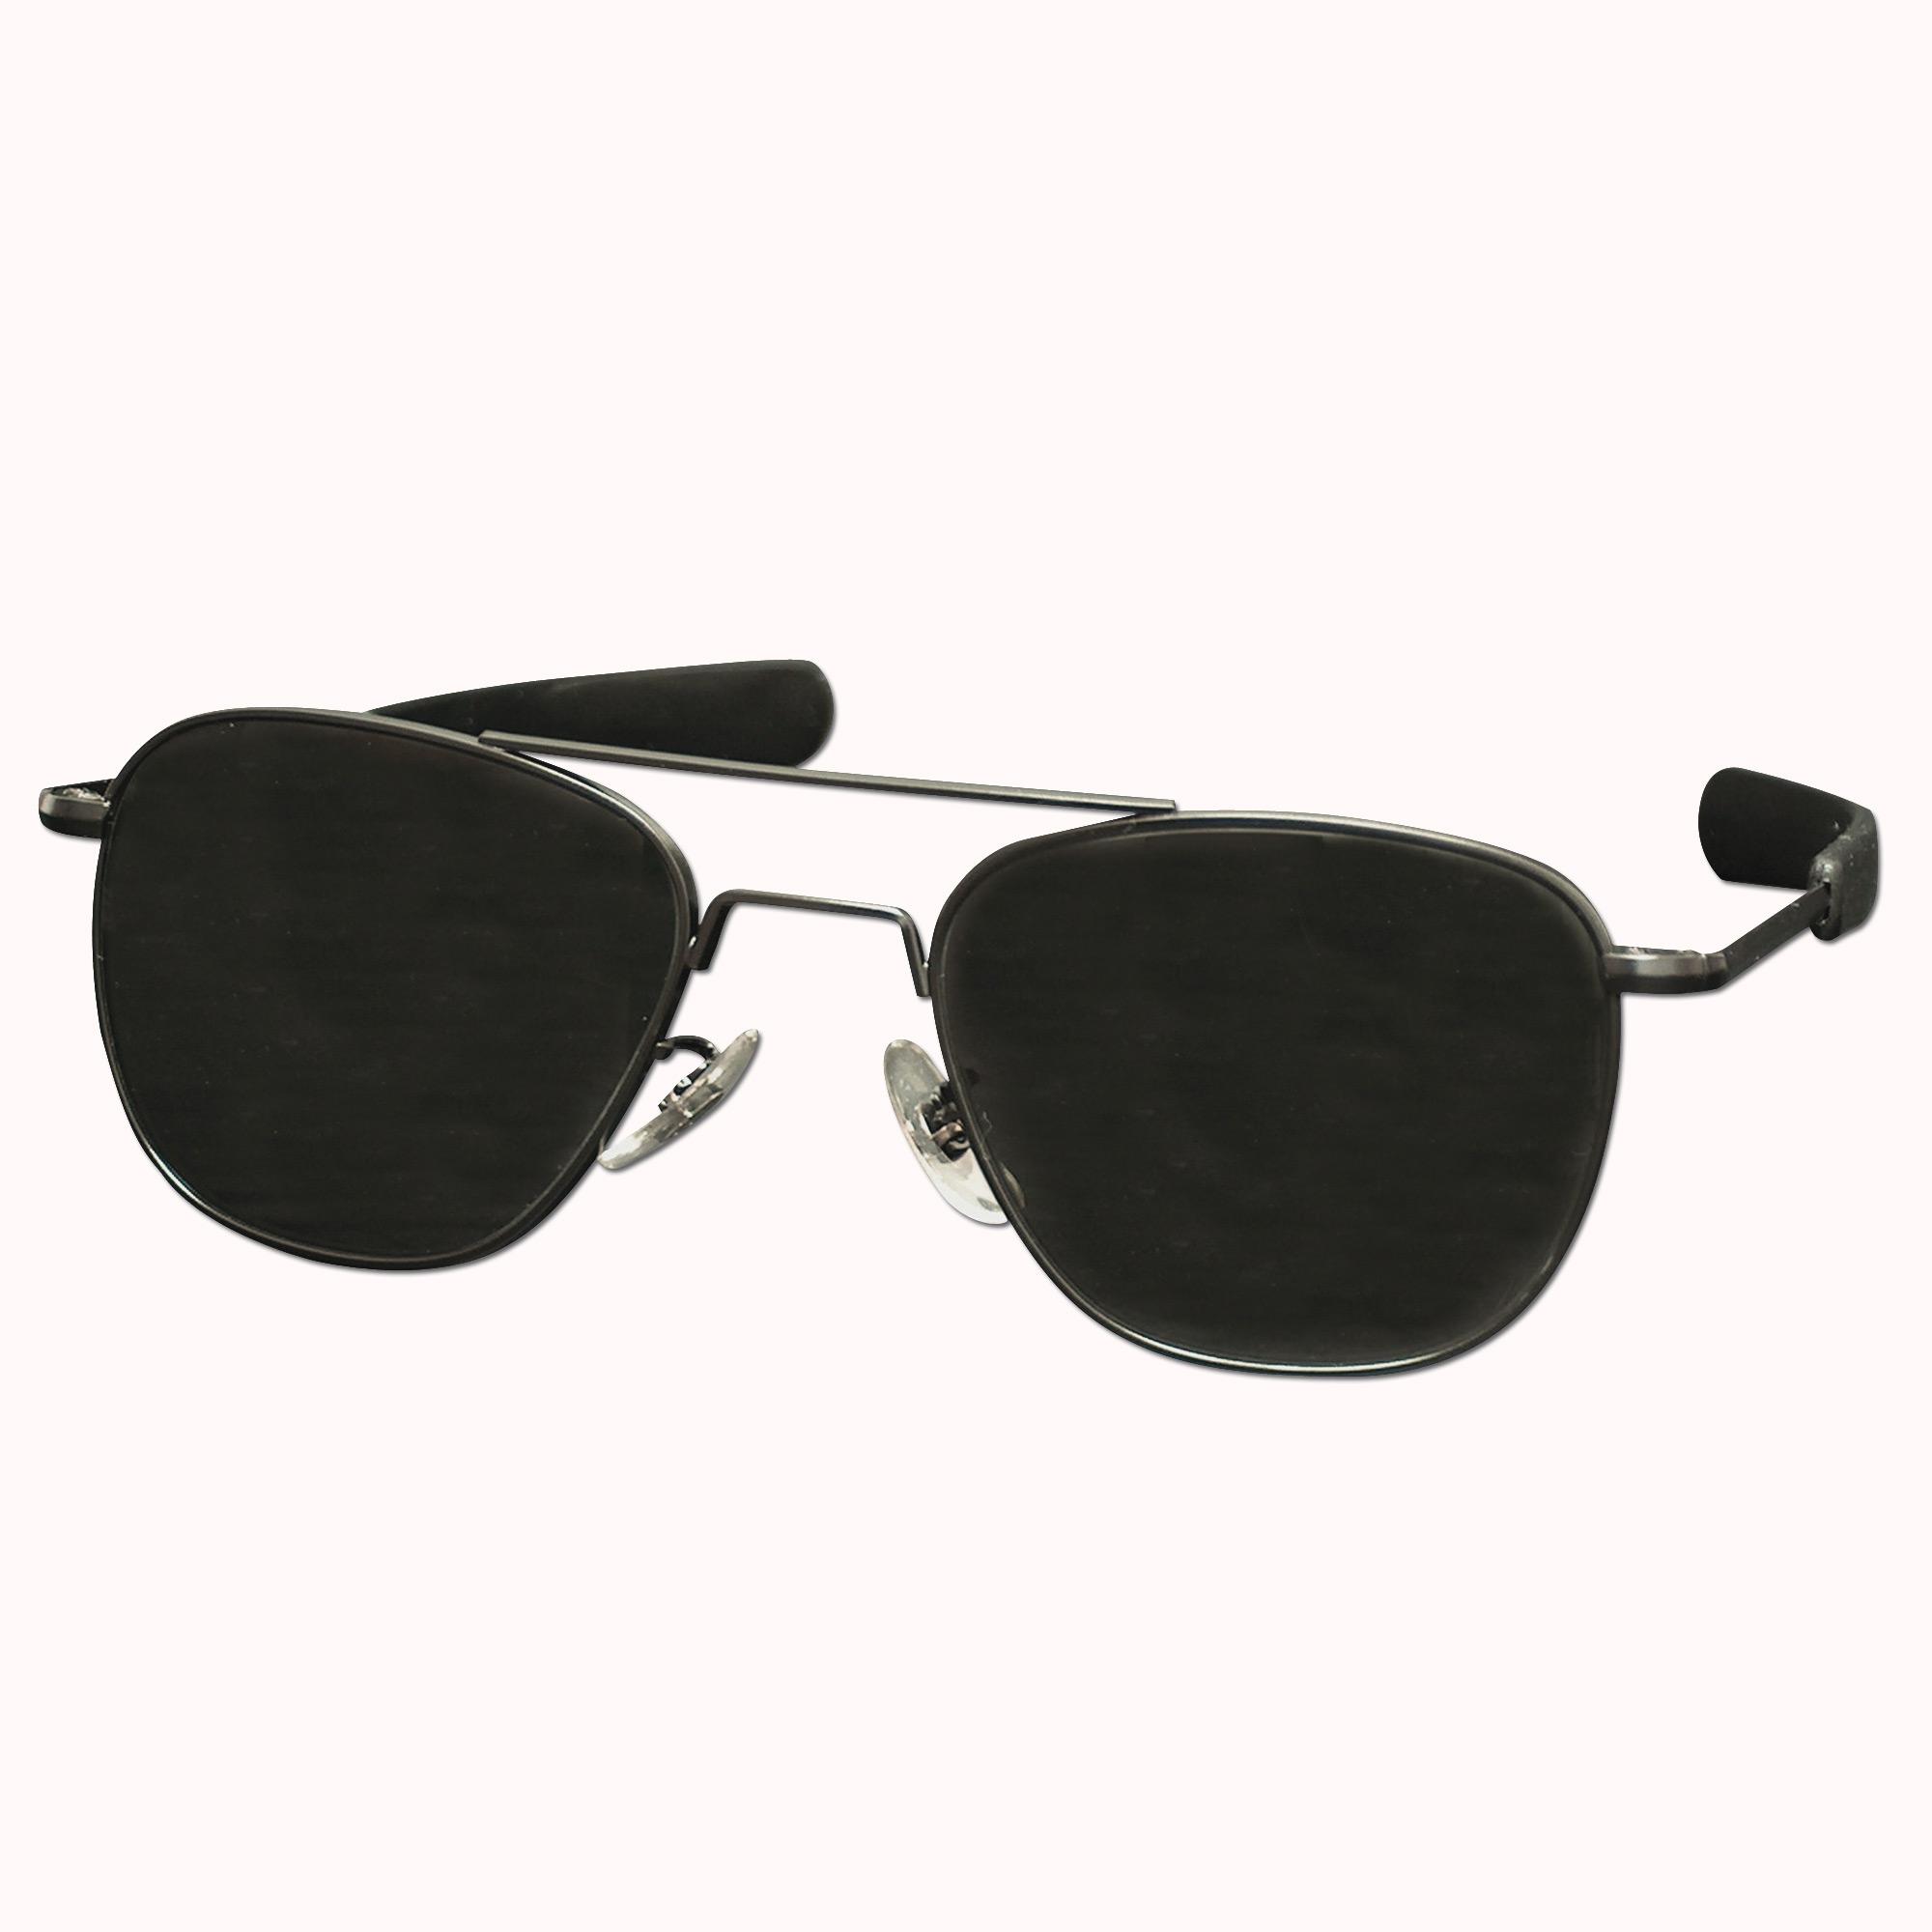 Aviator Sunglasses, black 57 mm